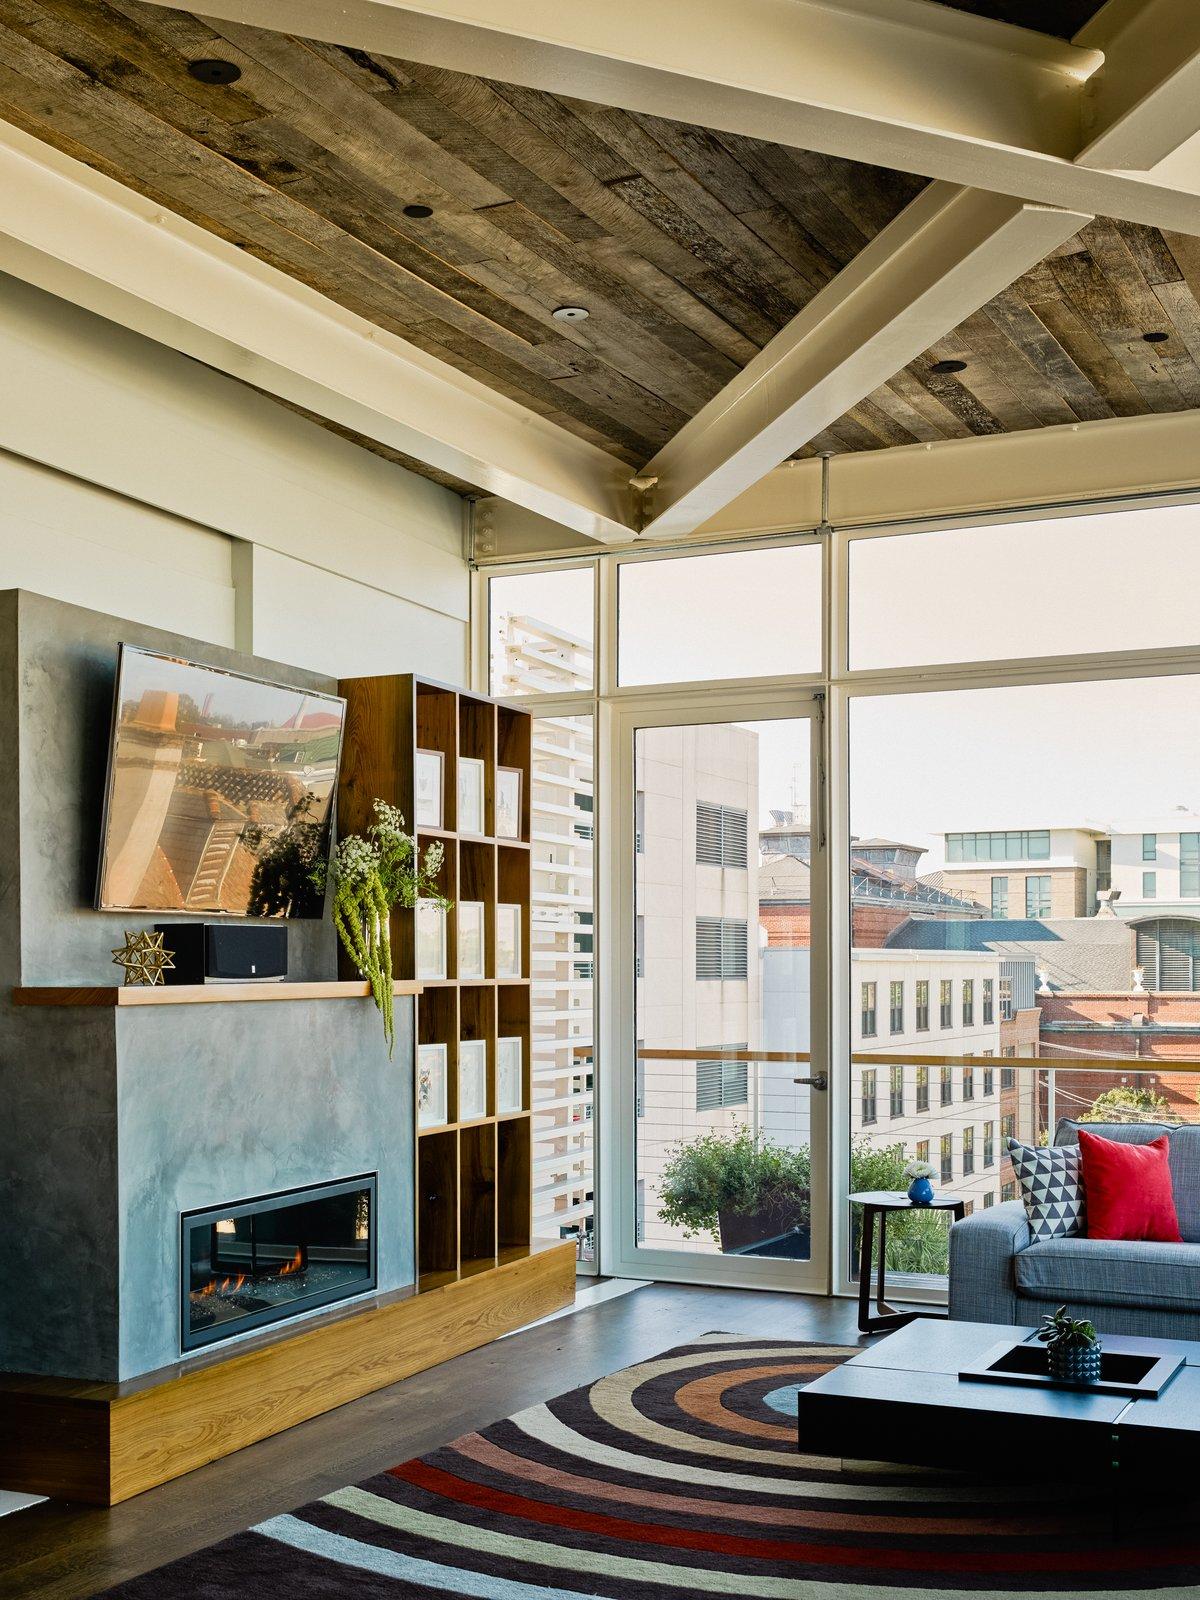 Living Room, Coffee Tables, Sofa, Dark Hardwood Floor, and Gas Burning Fireplace  SKY residence